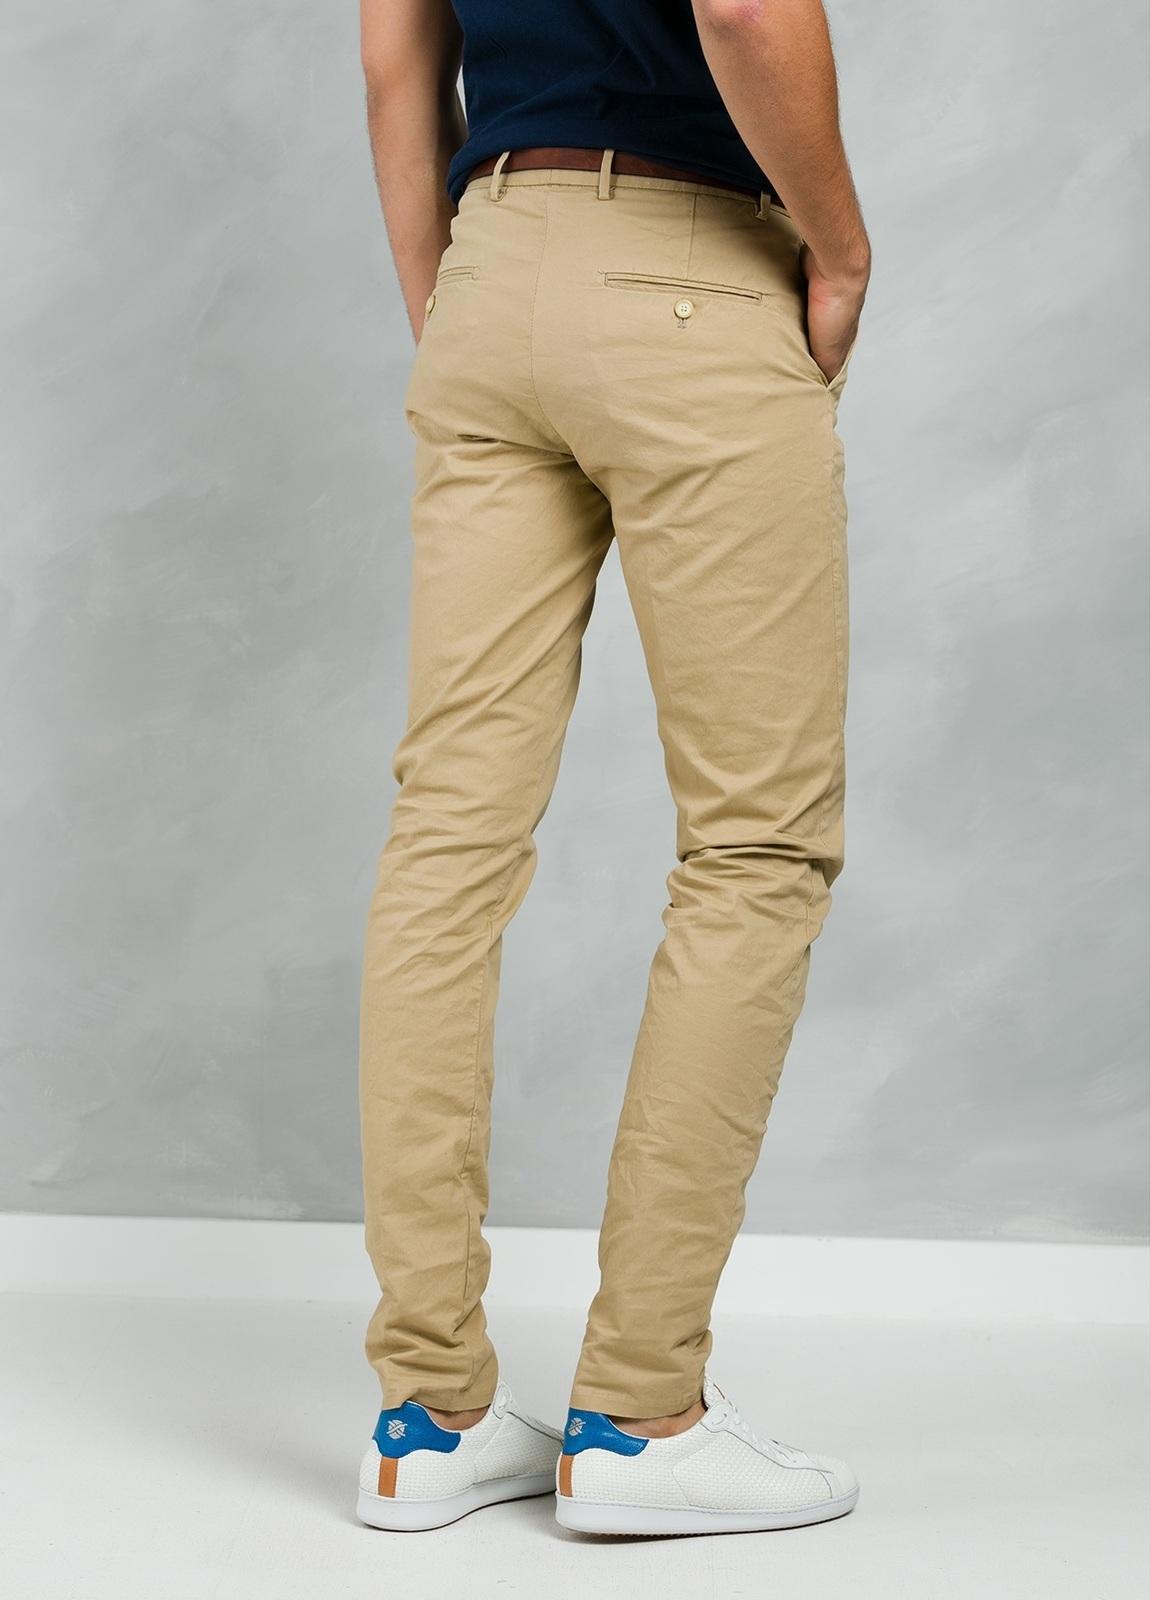 Pantalón chino color tostado, Algodón. - Ítem1